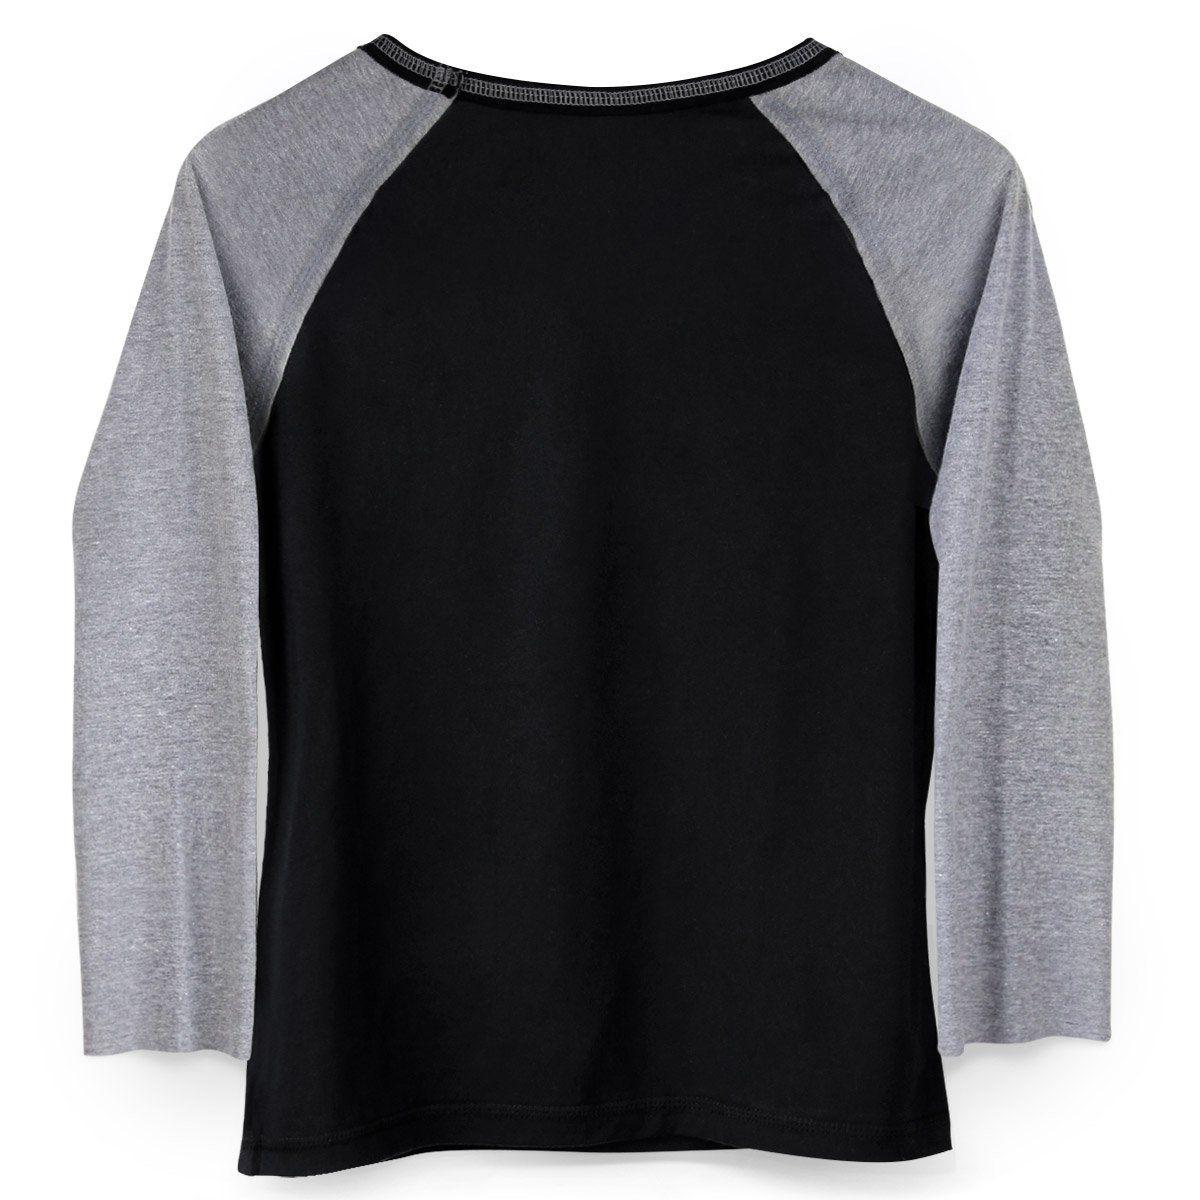 Camiseta Raglan Feminina Catwoman  - bandUP Store Marketplace